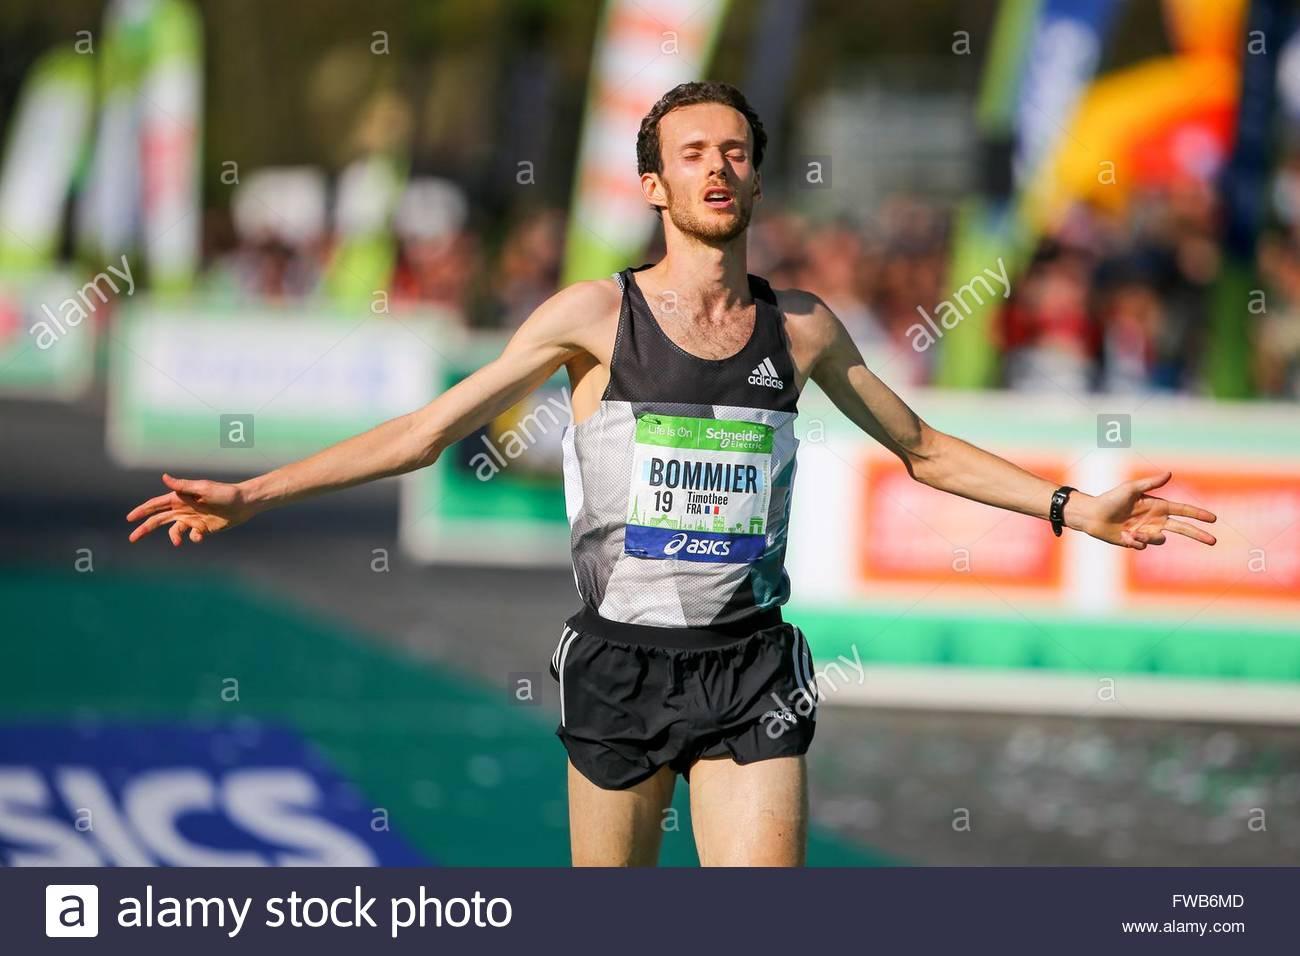 Paris,France. April 3rd, 2016. French Thierry Bommier passes the finish line of the 40th Paris Marathon, on April - Stock Image